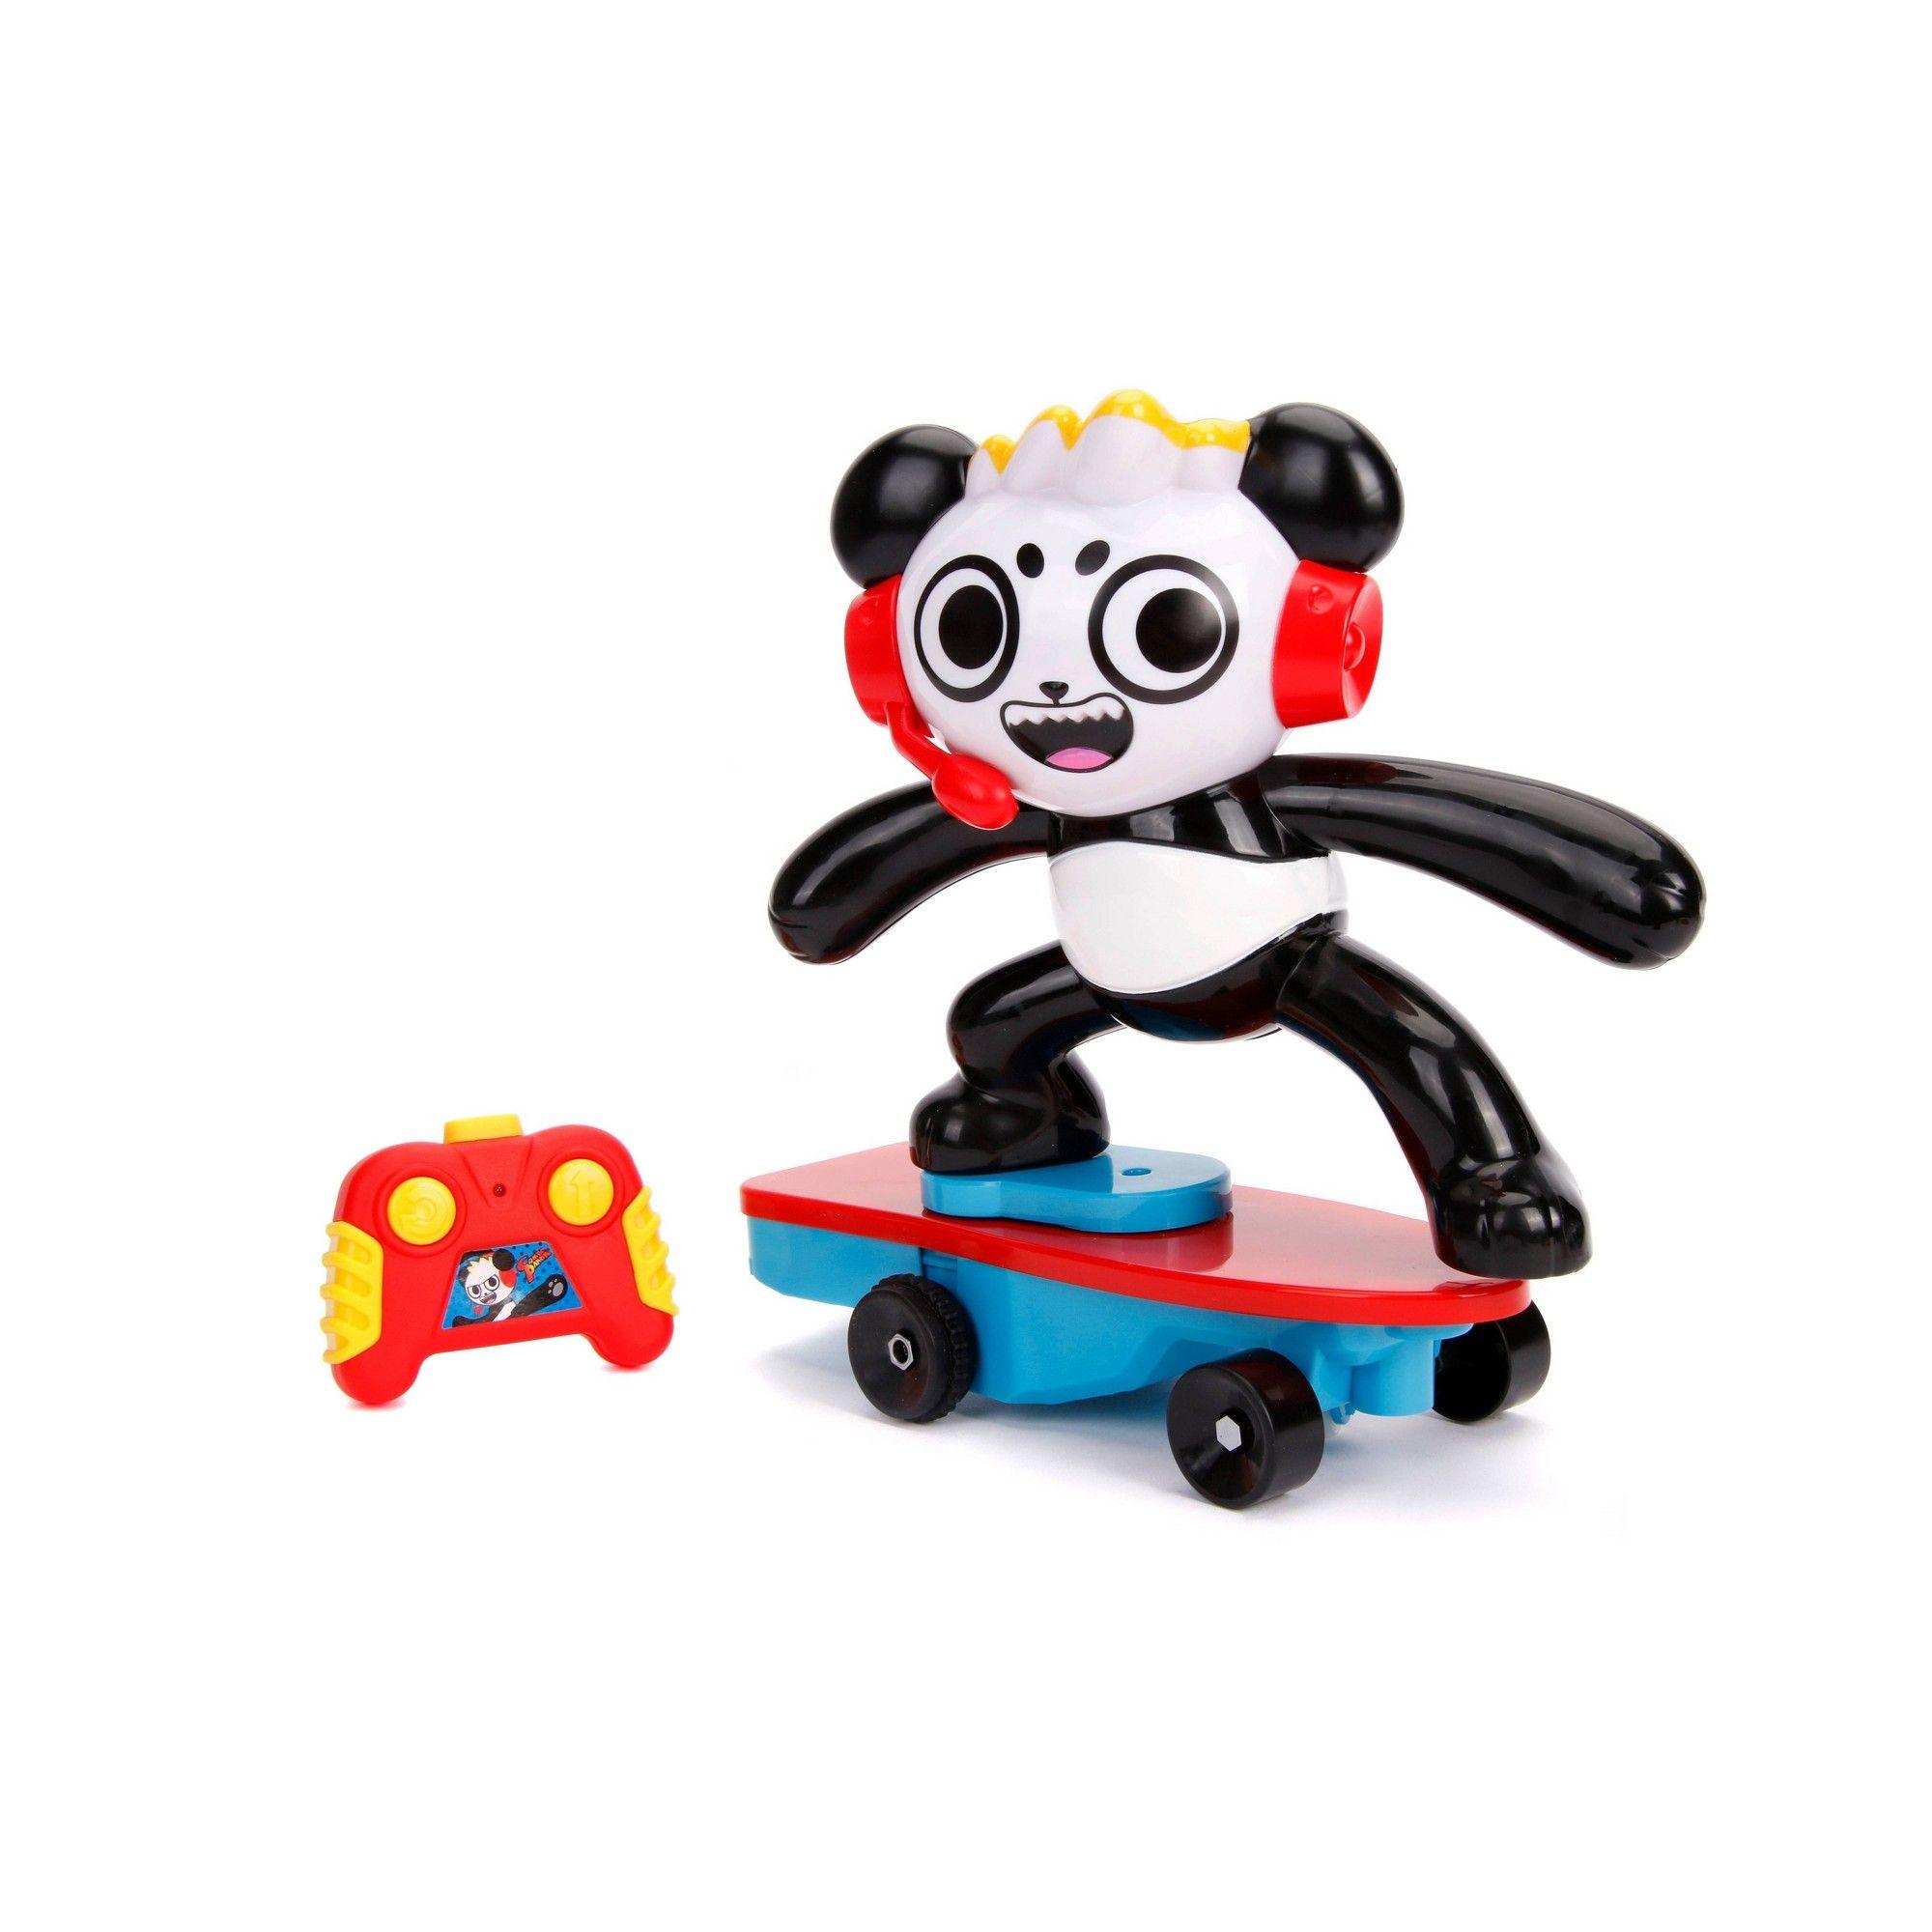 Jada Toys Ryan's World Combo Panda Skateboard Stunt R/C 10